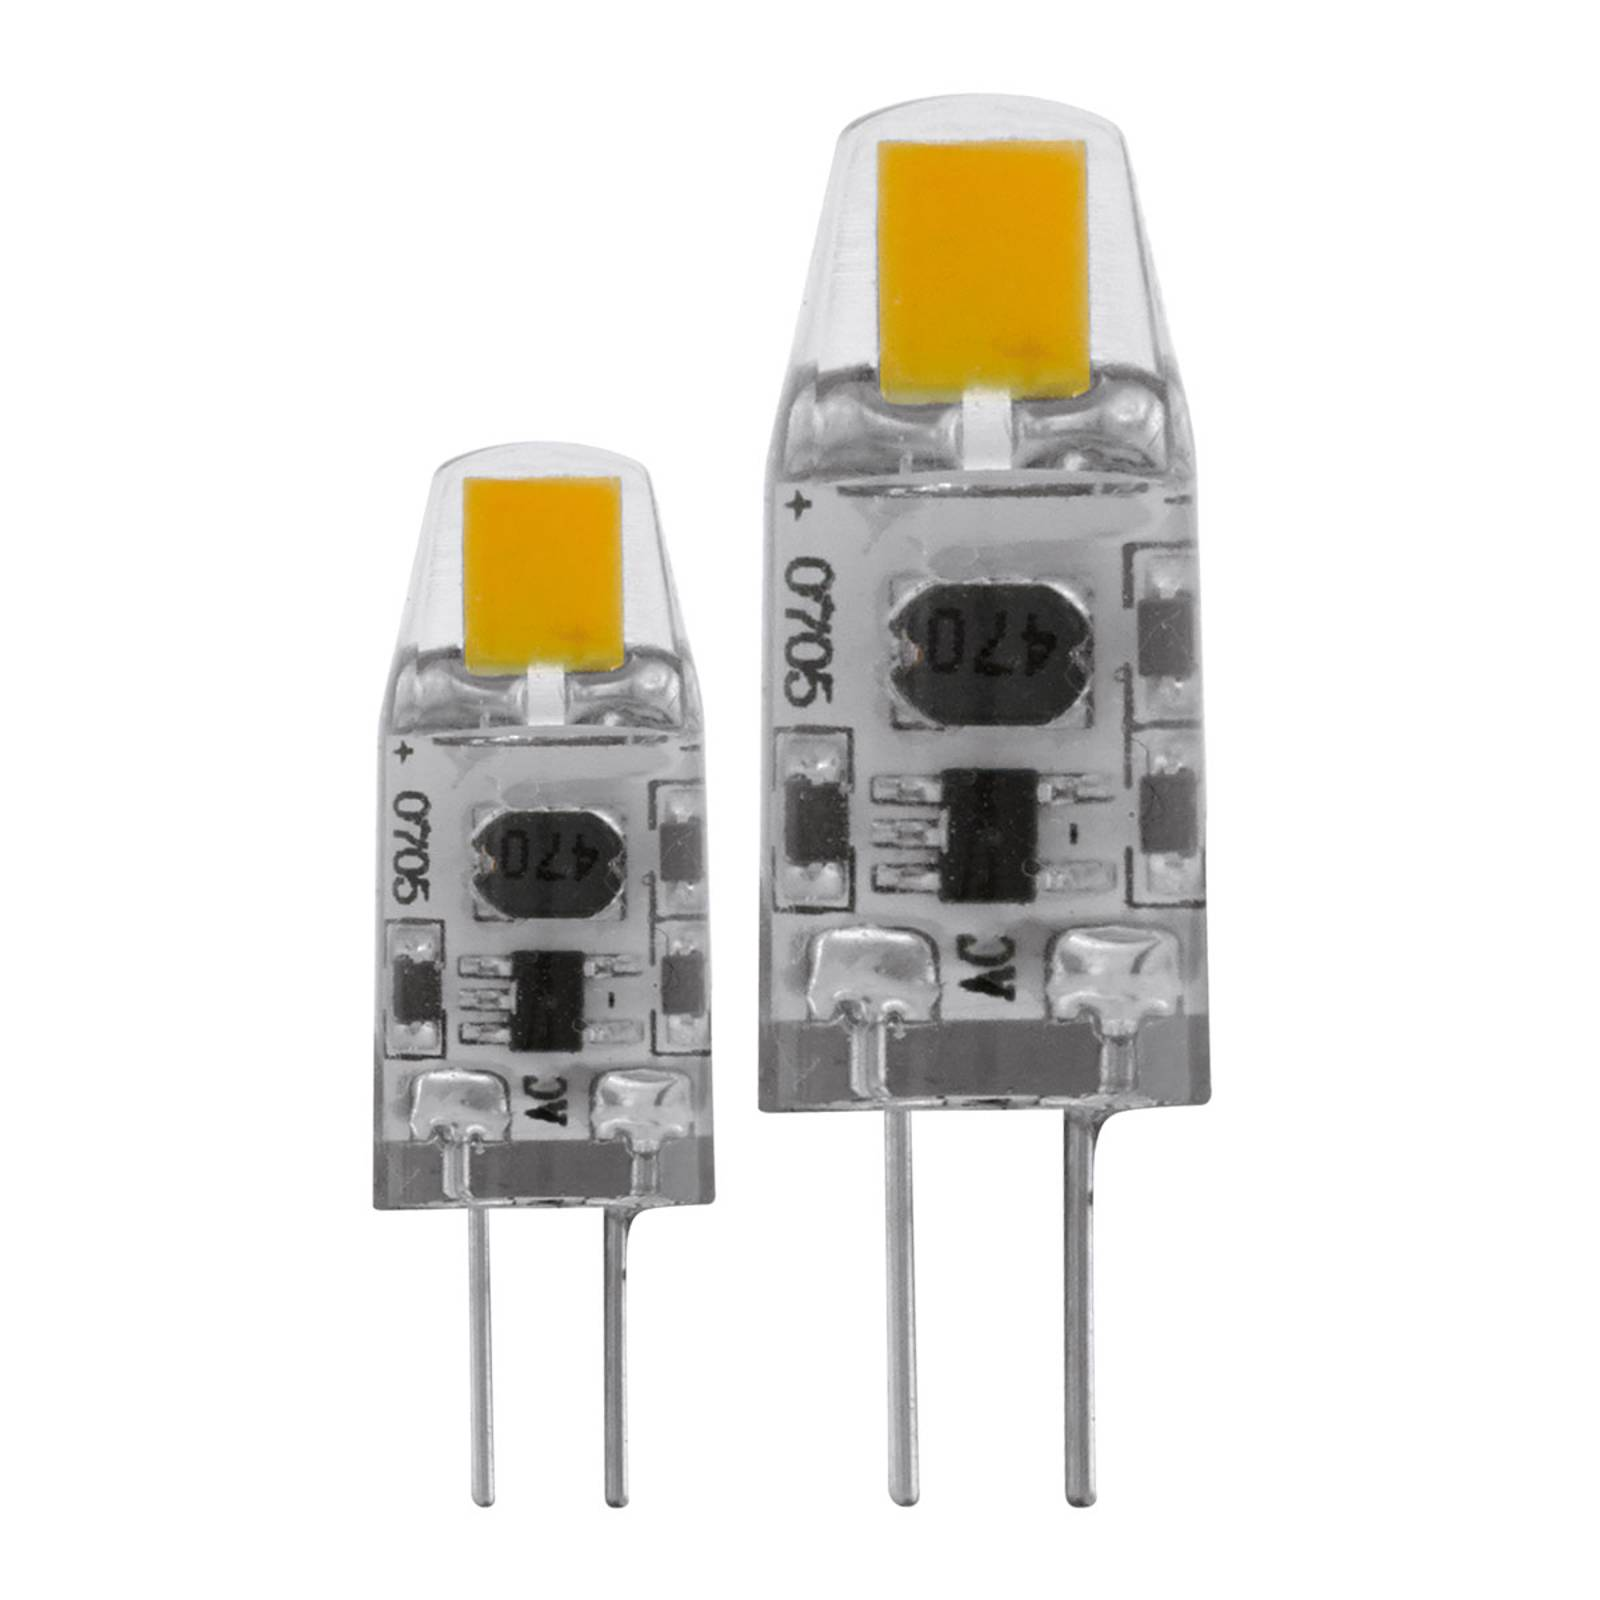 LED lamp G4 1,8W, warmwit in pak van 2 stuks